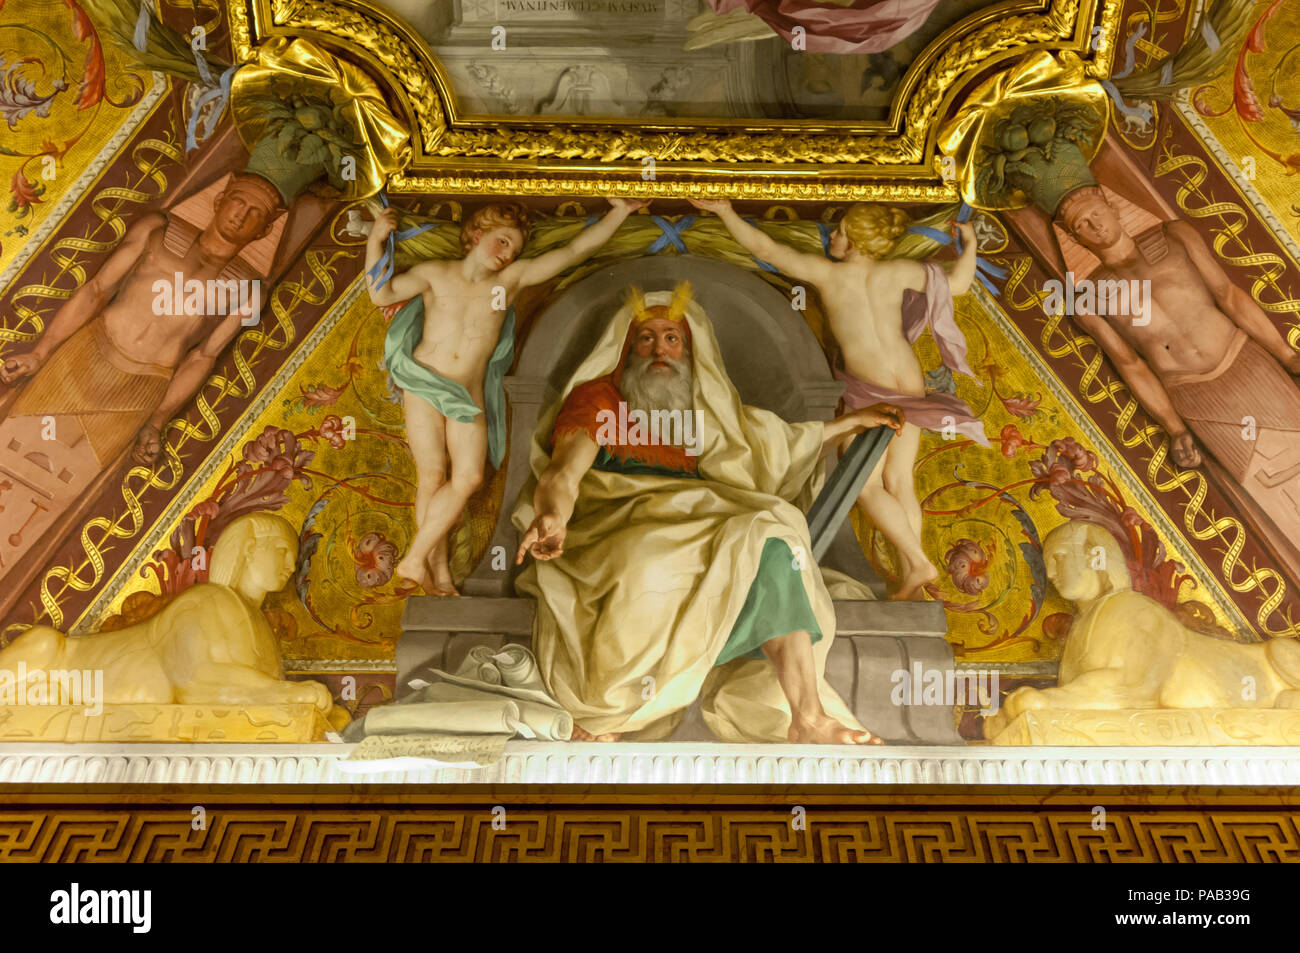 Vatican Mural Painting Wall Rome Stock Photos & Vatican Mural ...